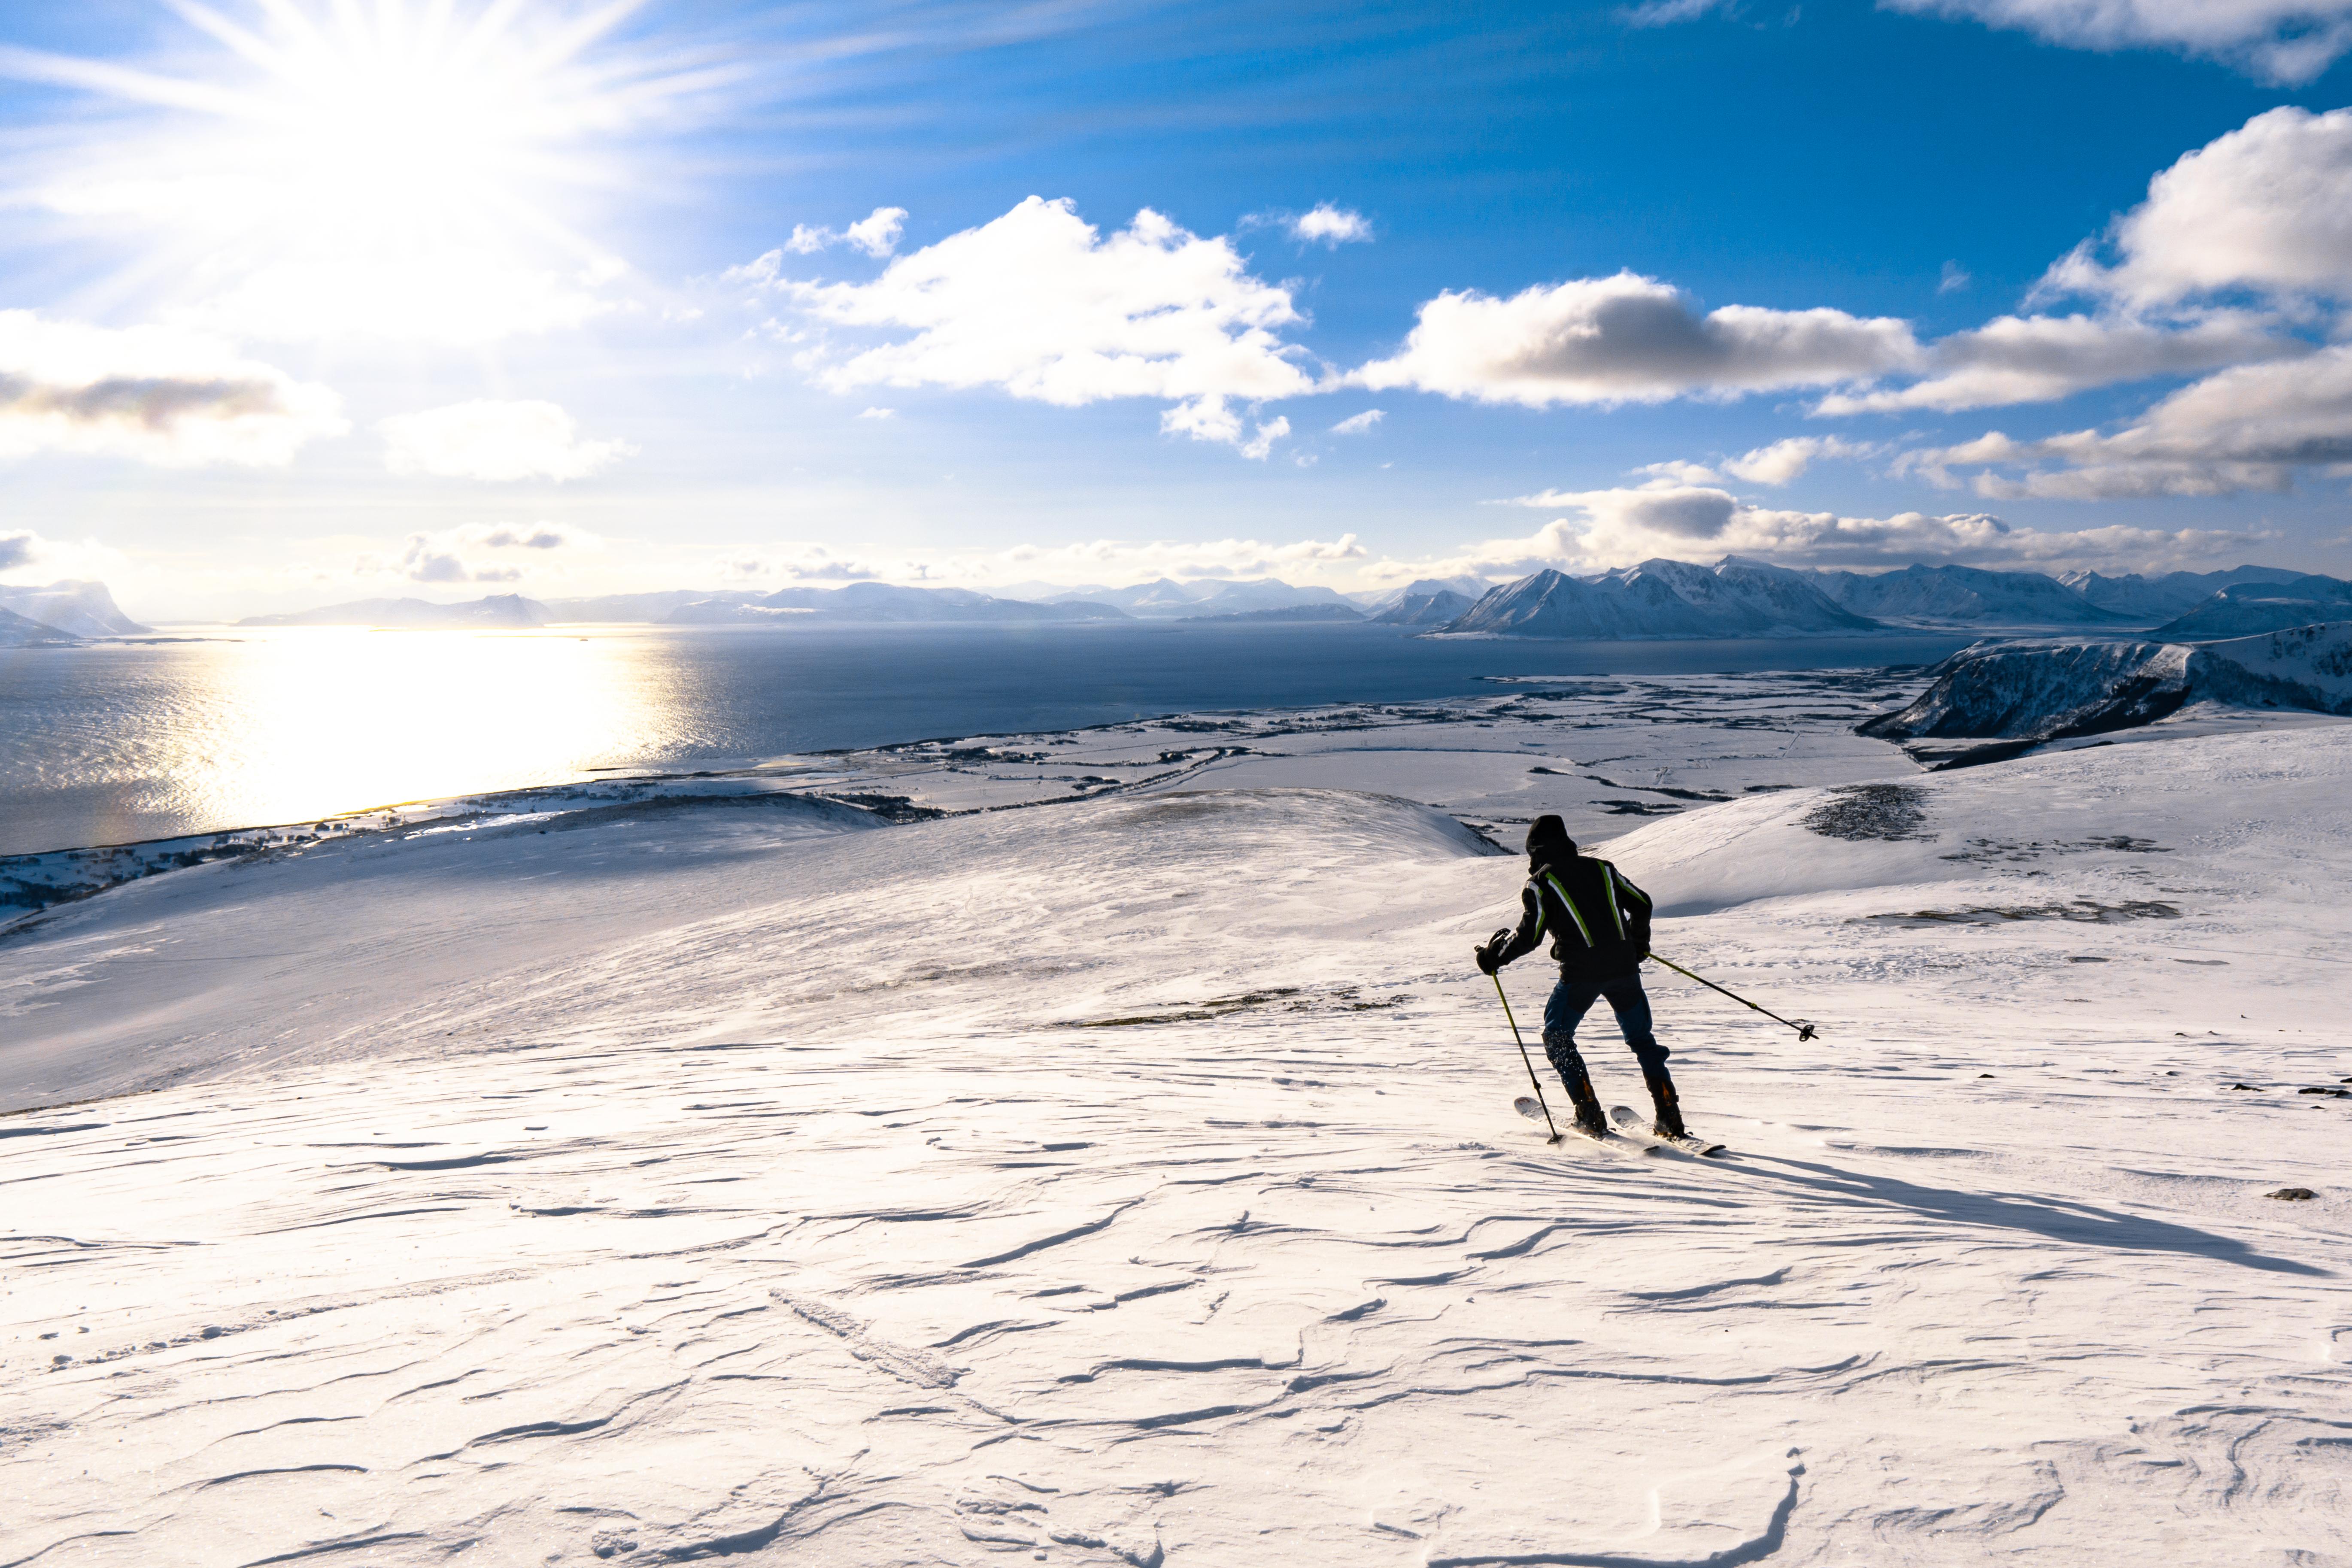 Man Skiing on Snowy Mountains of Norway Stock Photo picjumbo 5479x3653